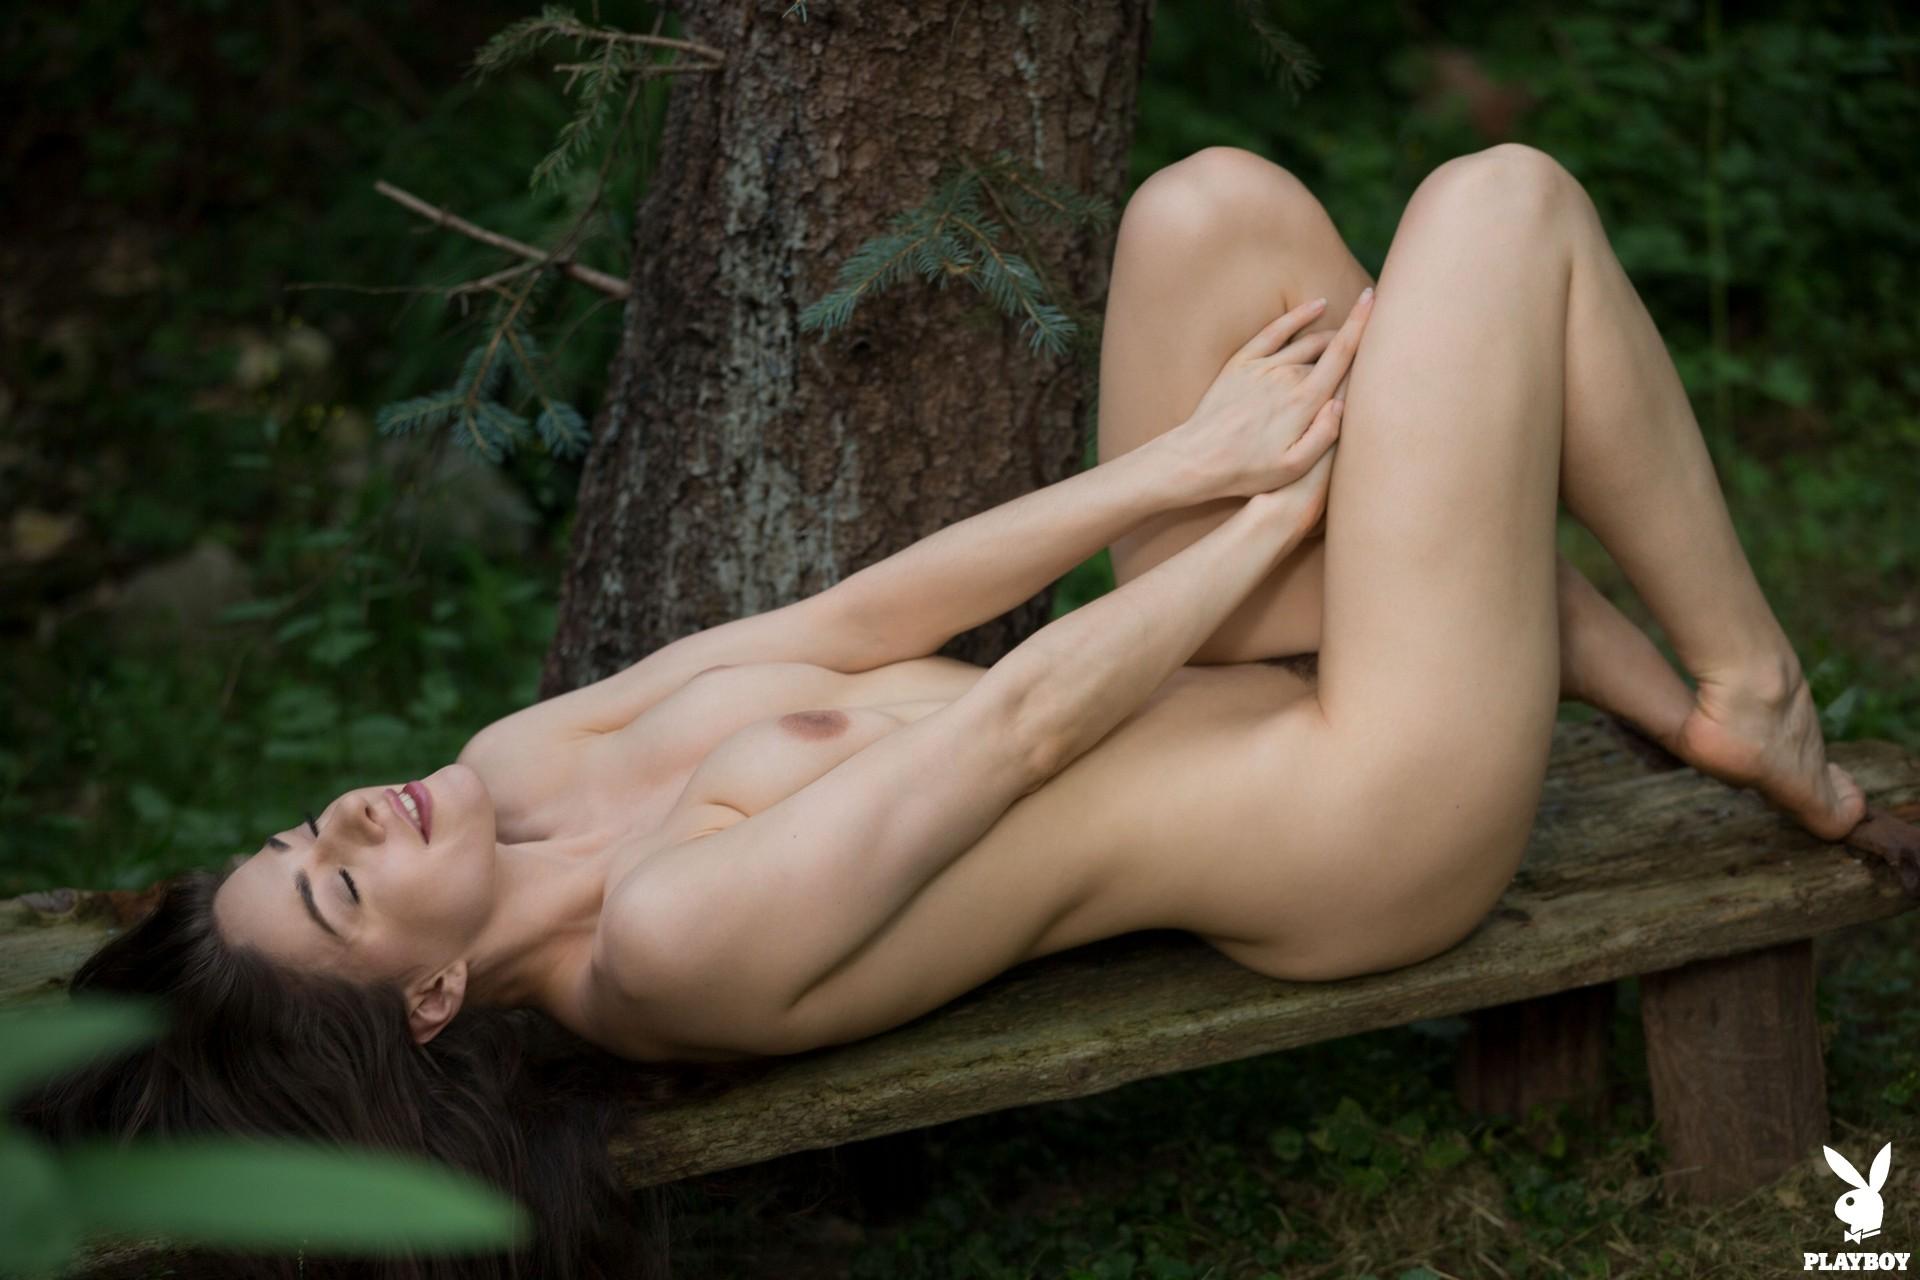 Joy Draiki in Mystic Escape - Playboy Plus 28